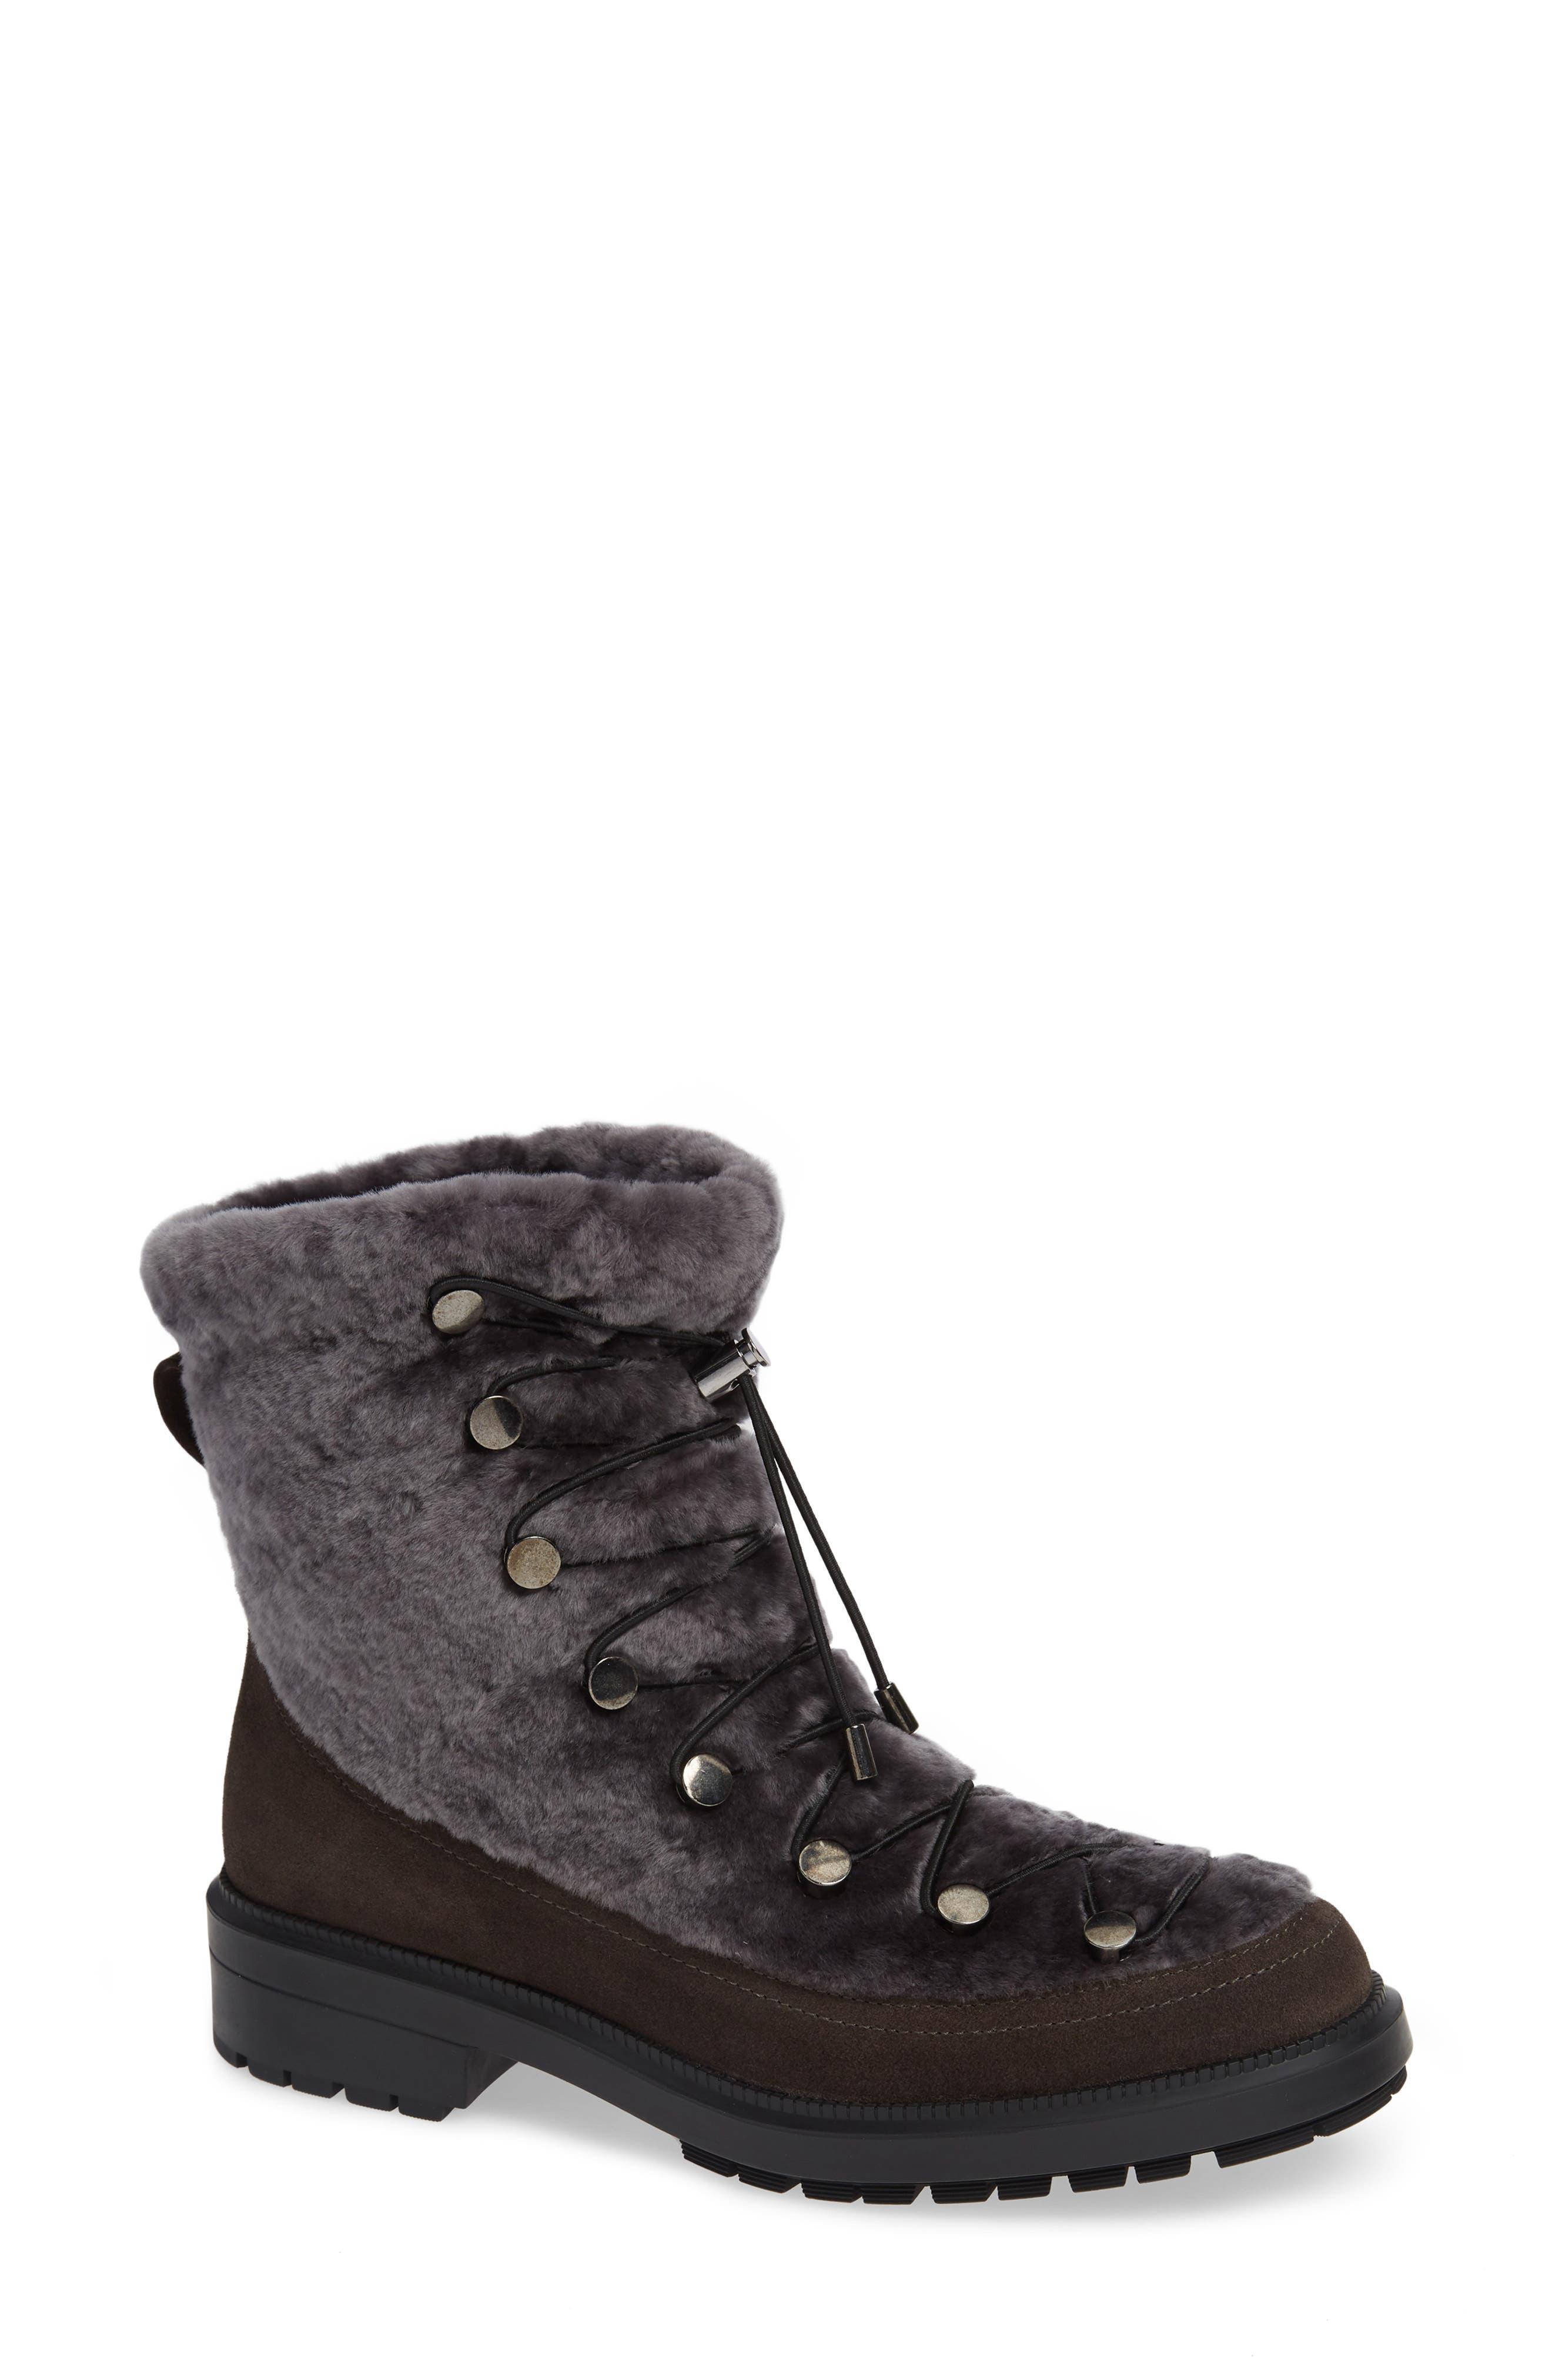 Aquatalia Lorena Genuine Shearling Boot, Grey